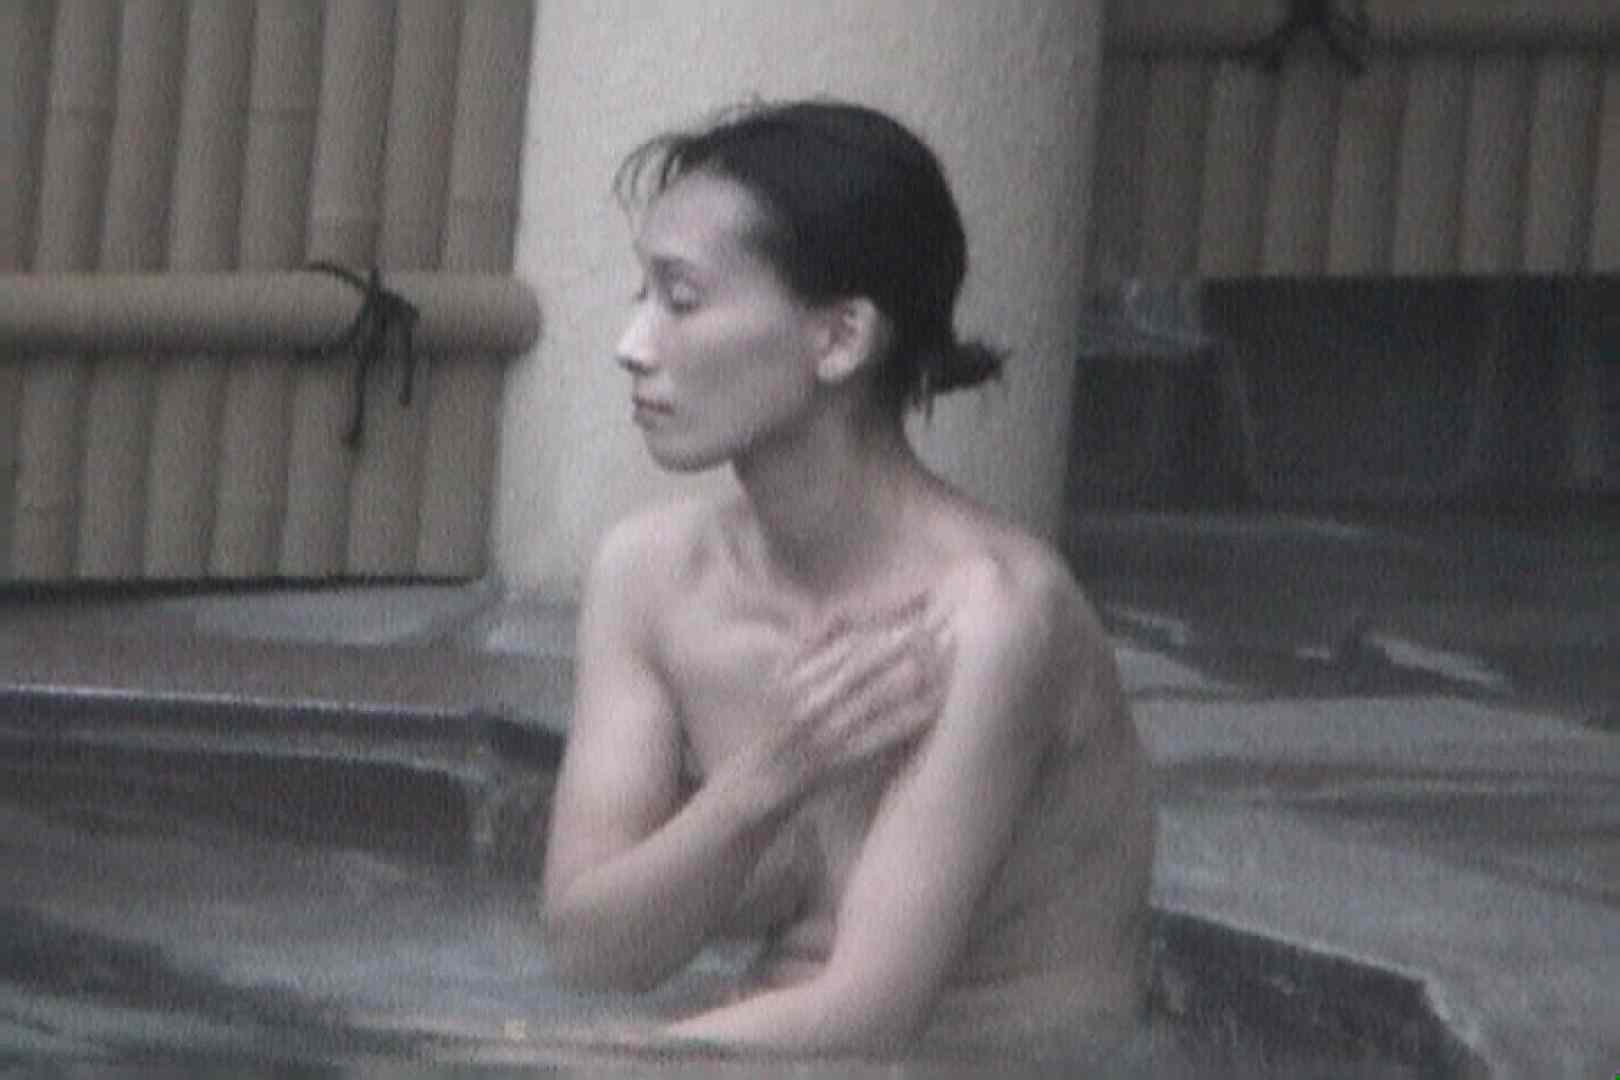 Aquaな露天風呂Vol.557 盗撮 盗み撮り動画キャプチャ 34連発 5